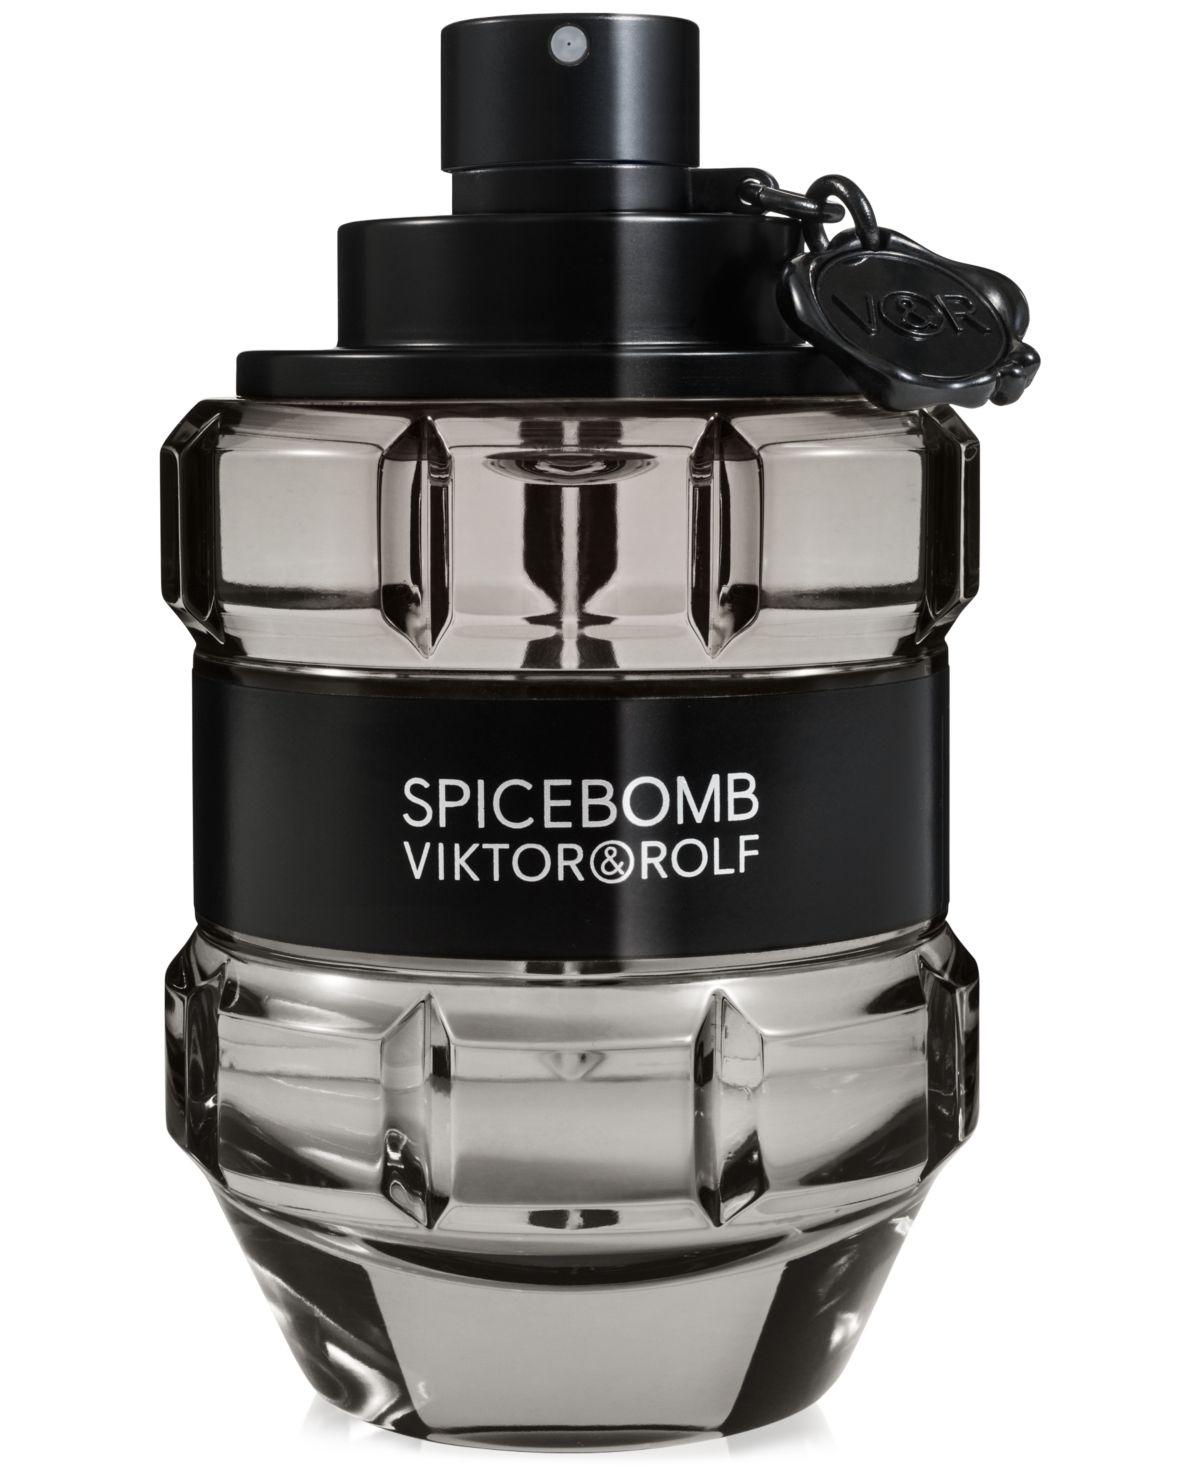 Men S Spicebomb Eau De Toilette Spray 5 Oz Products In 2019 Eau De Toilette Fragrance Viktor Rolf